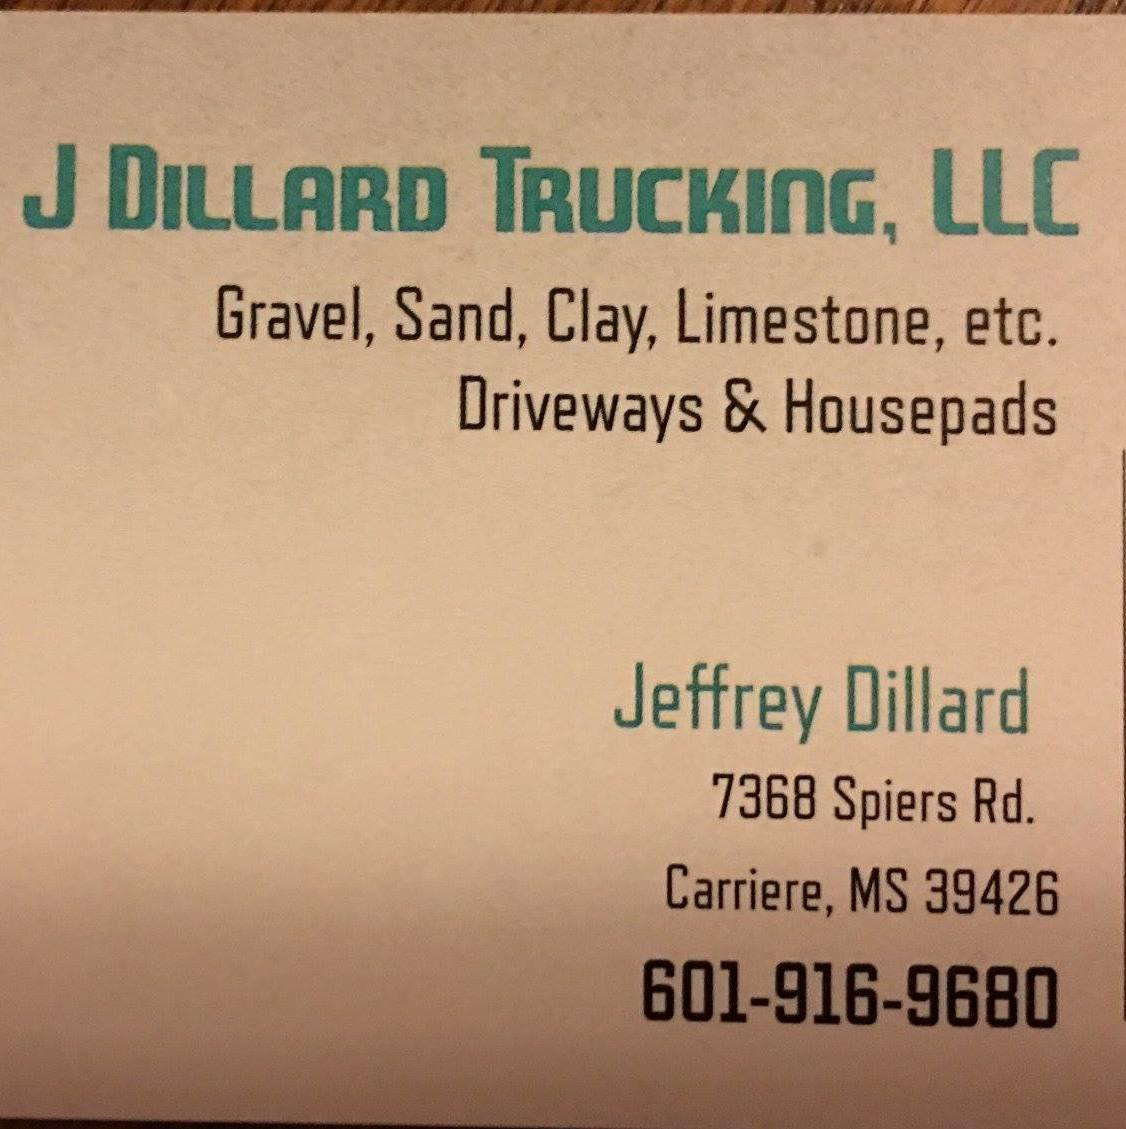 J Dillard's Trucking & Dozer Services image 0